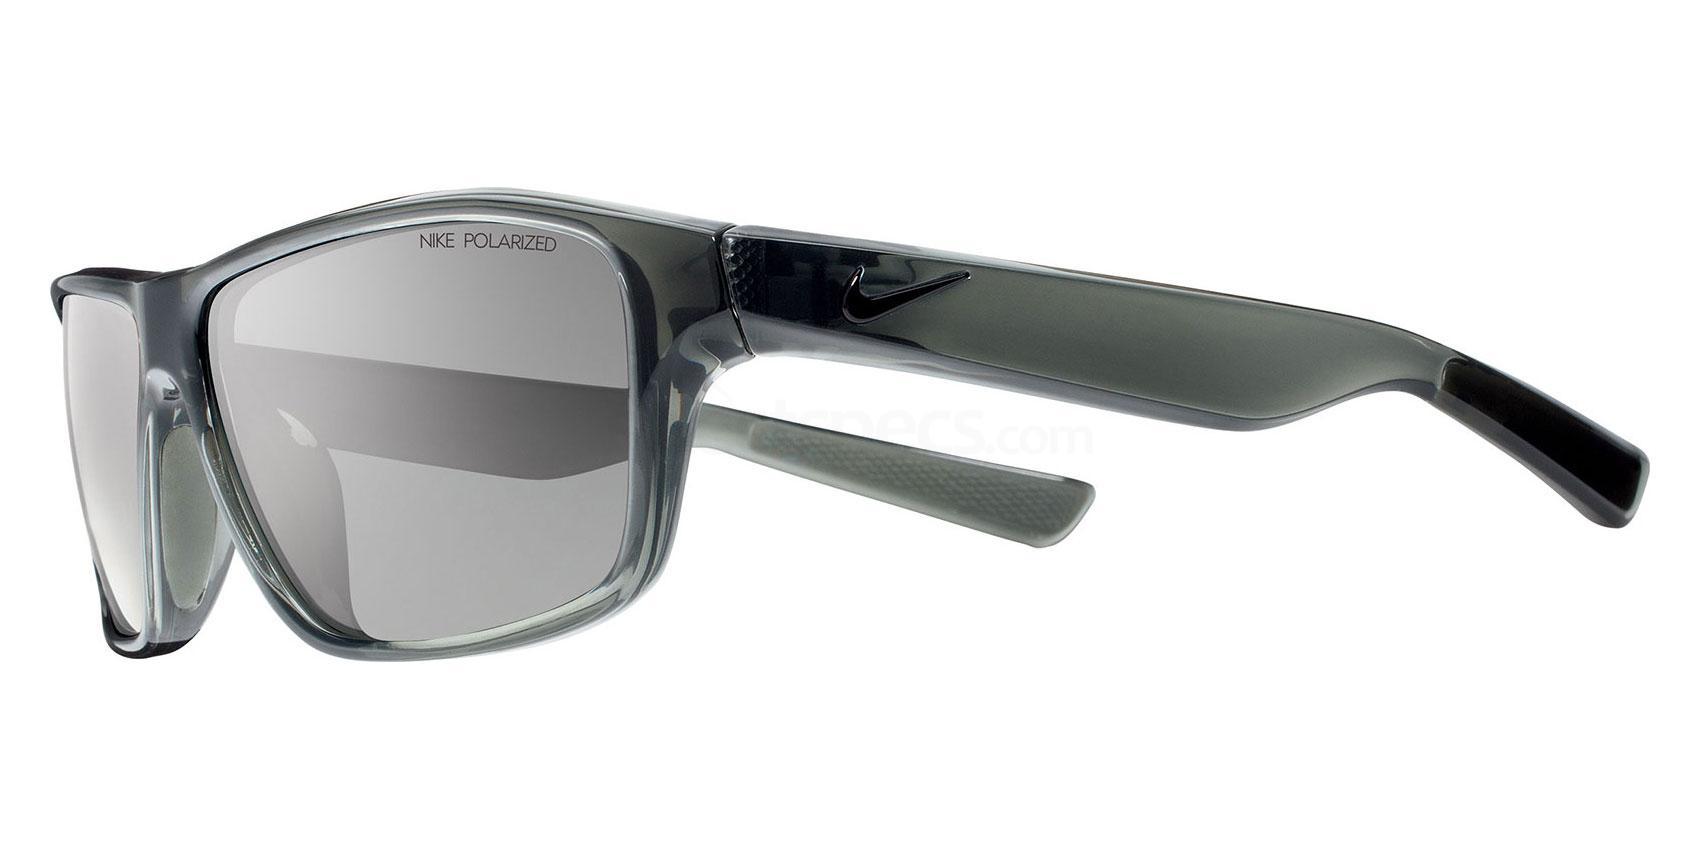 016 NIKE PREMIER 6.0P EV0790 Sunglasses, Nike